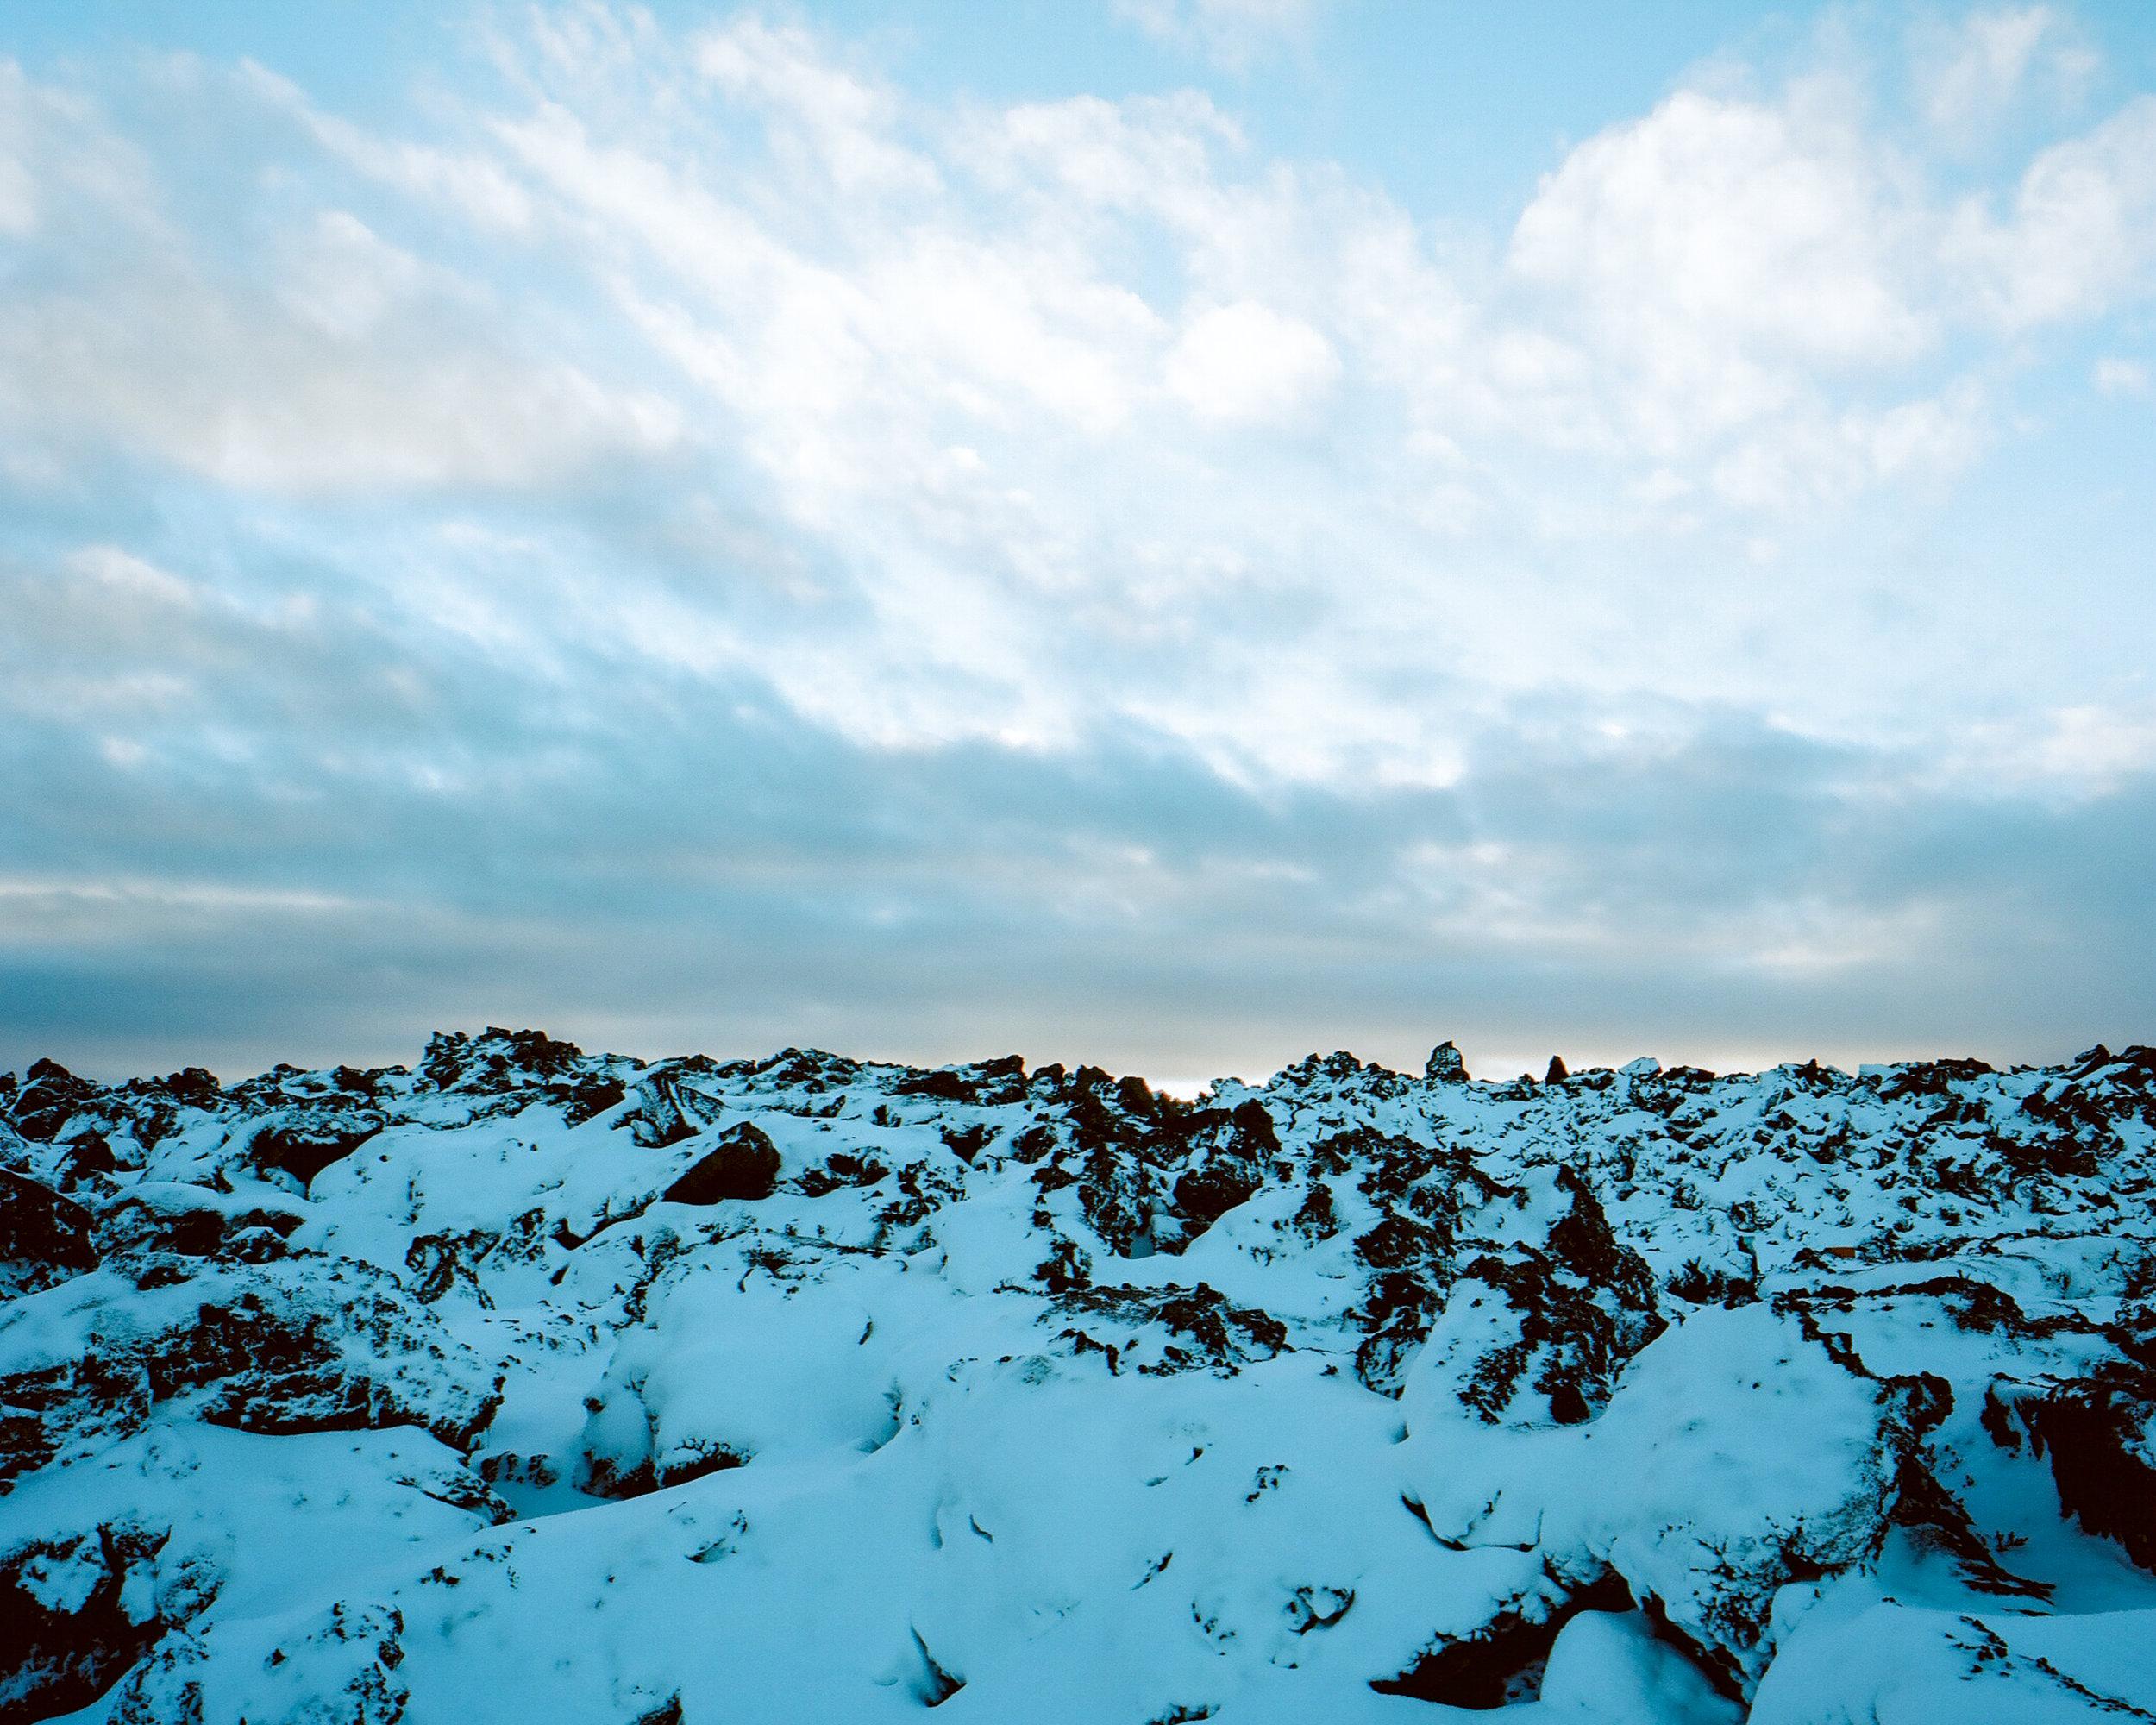 iceland_12_090_2_11.jpg